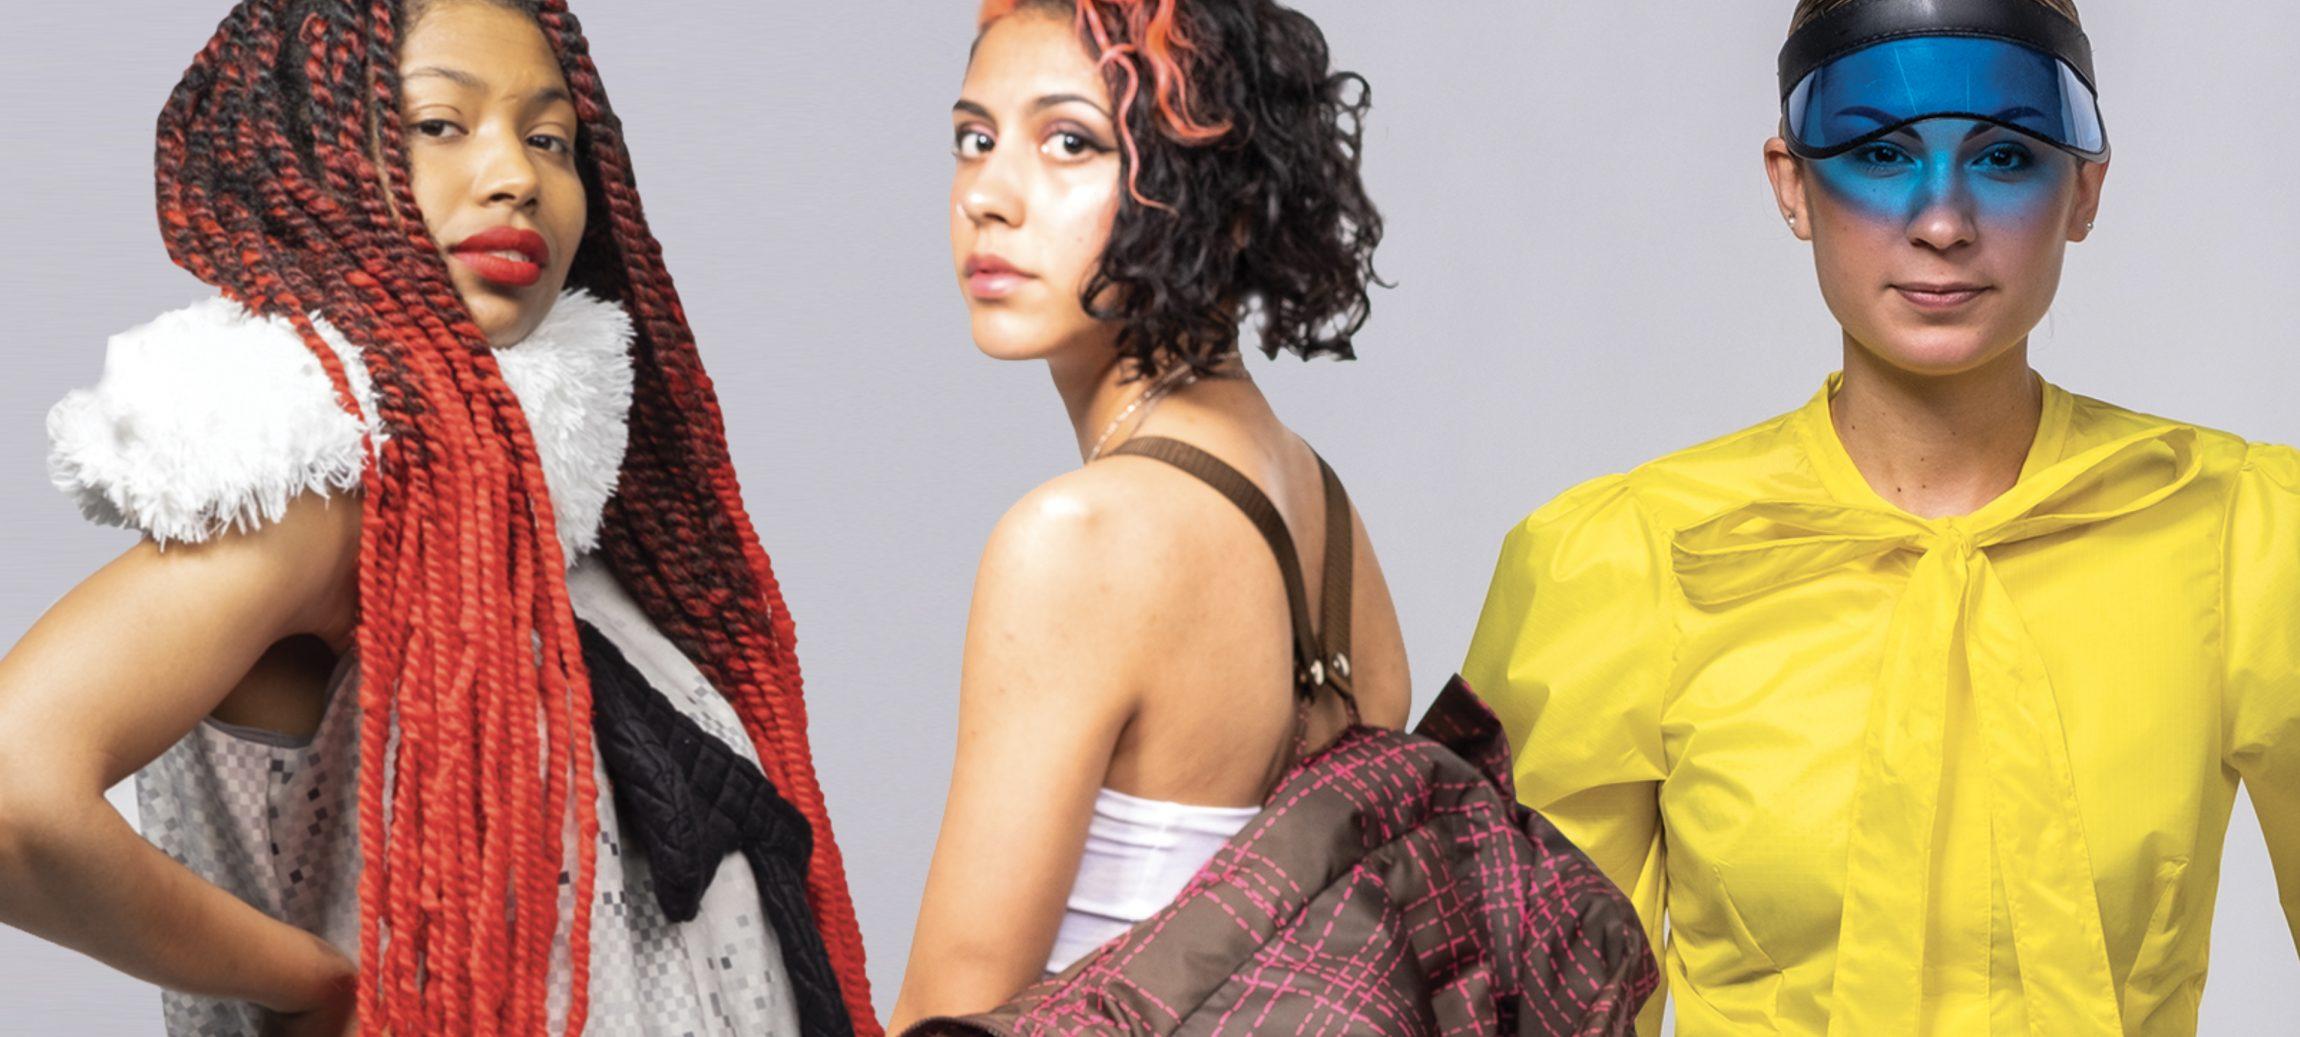 The MECA 2021 Fashion Show image